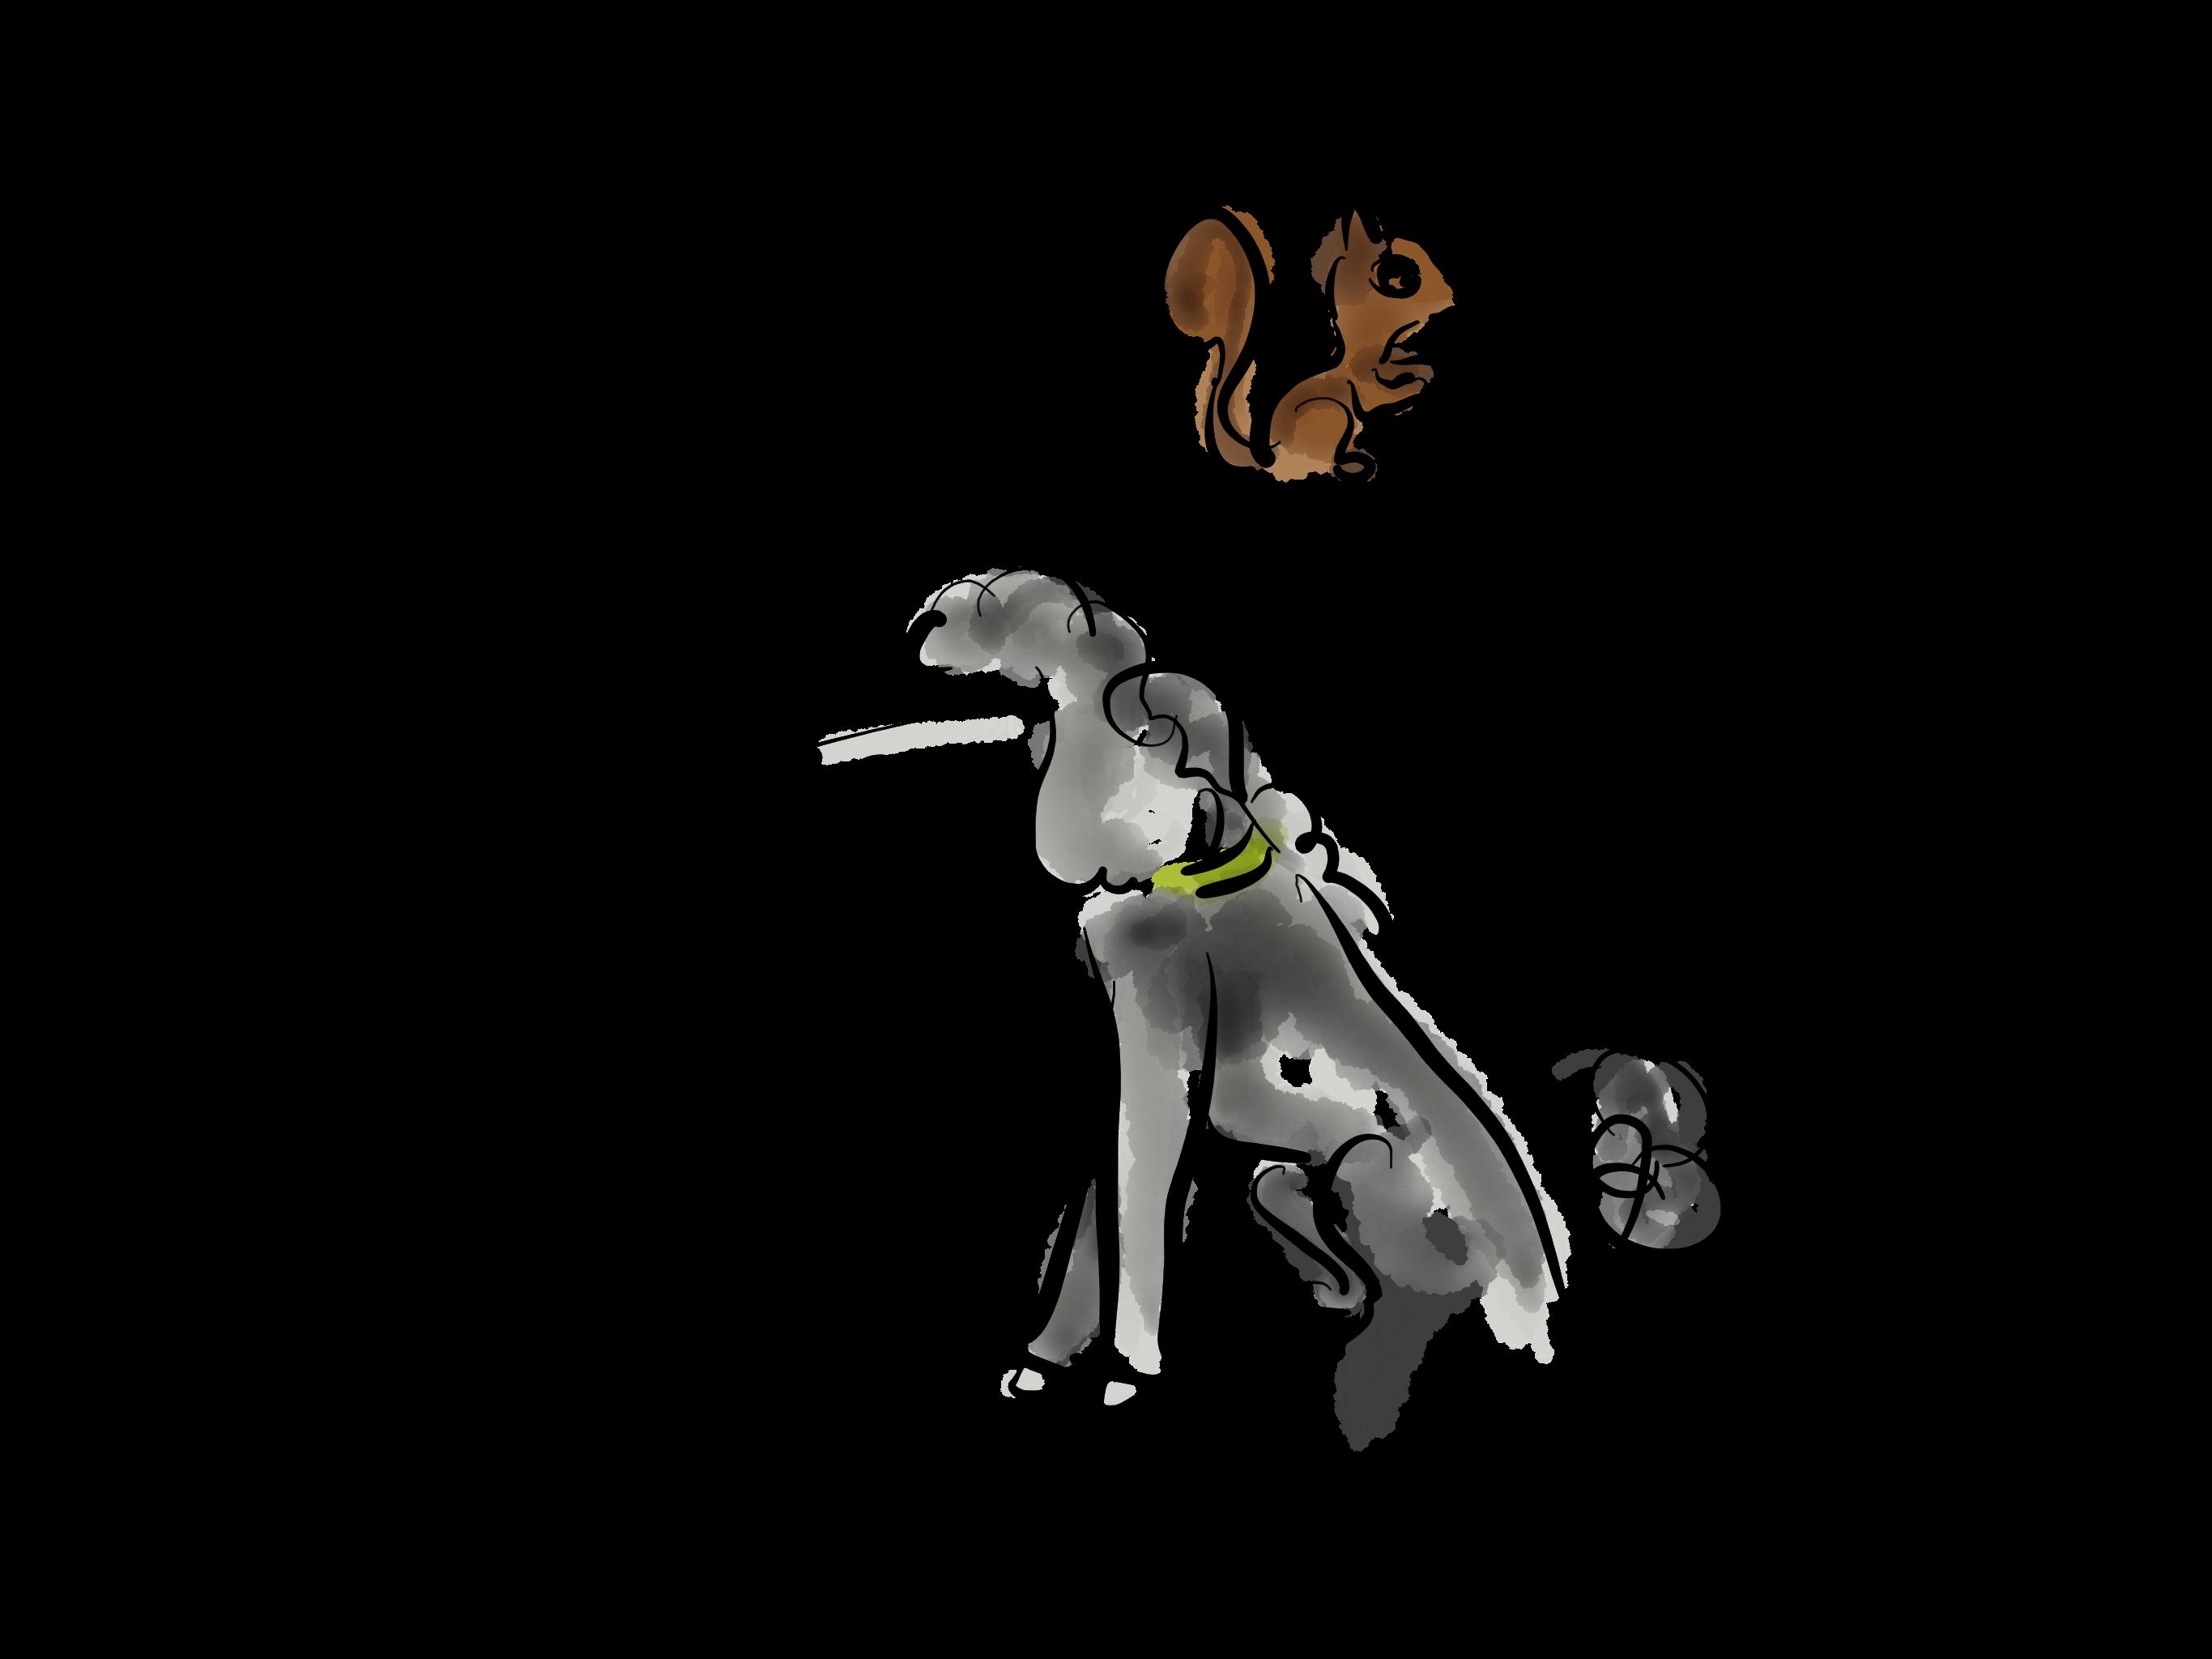 Pin by lora appel on dog art pinterest